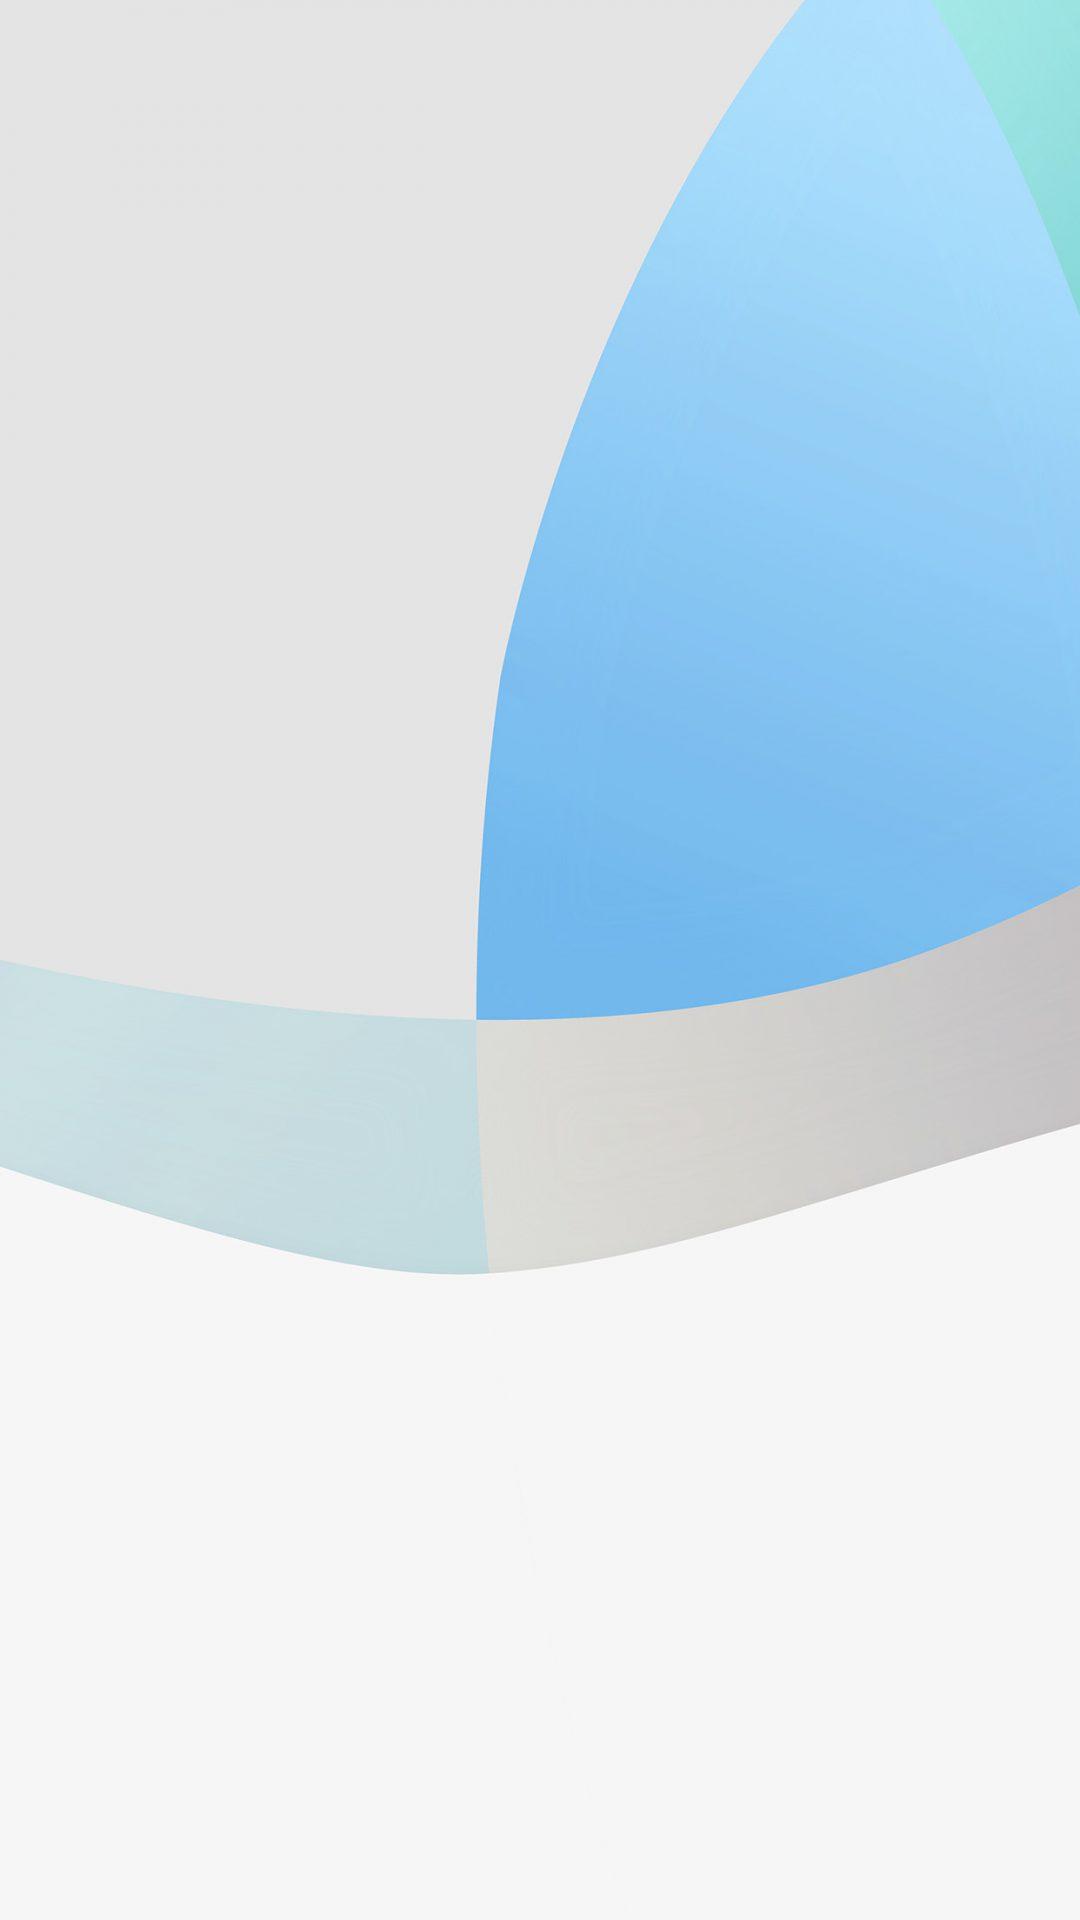 Apple Event March 2016 Art Logo Pattern Simple Blue